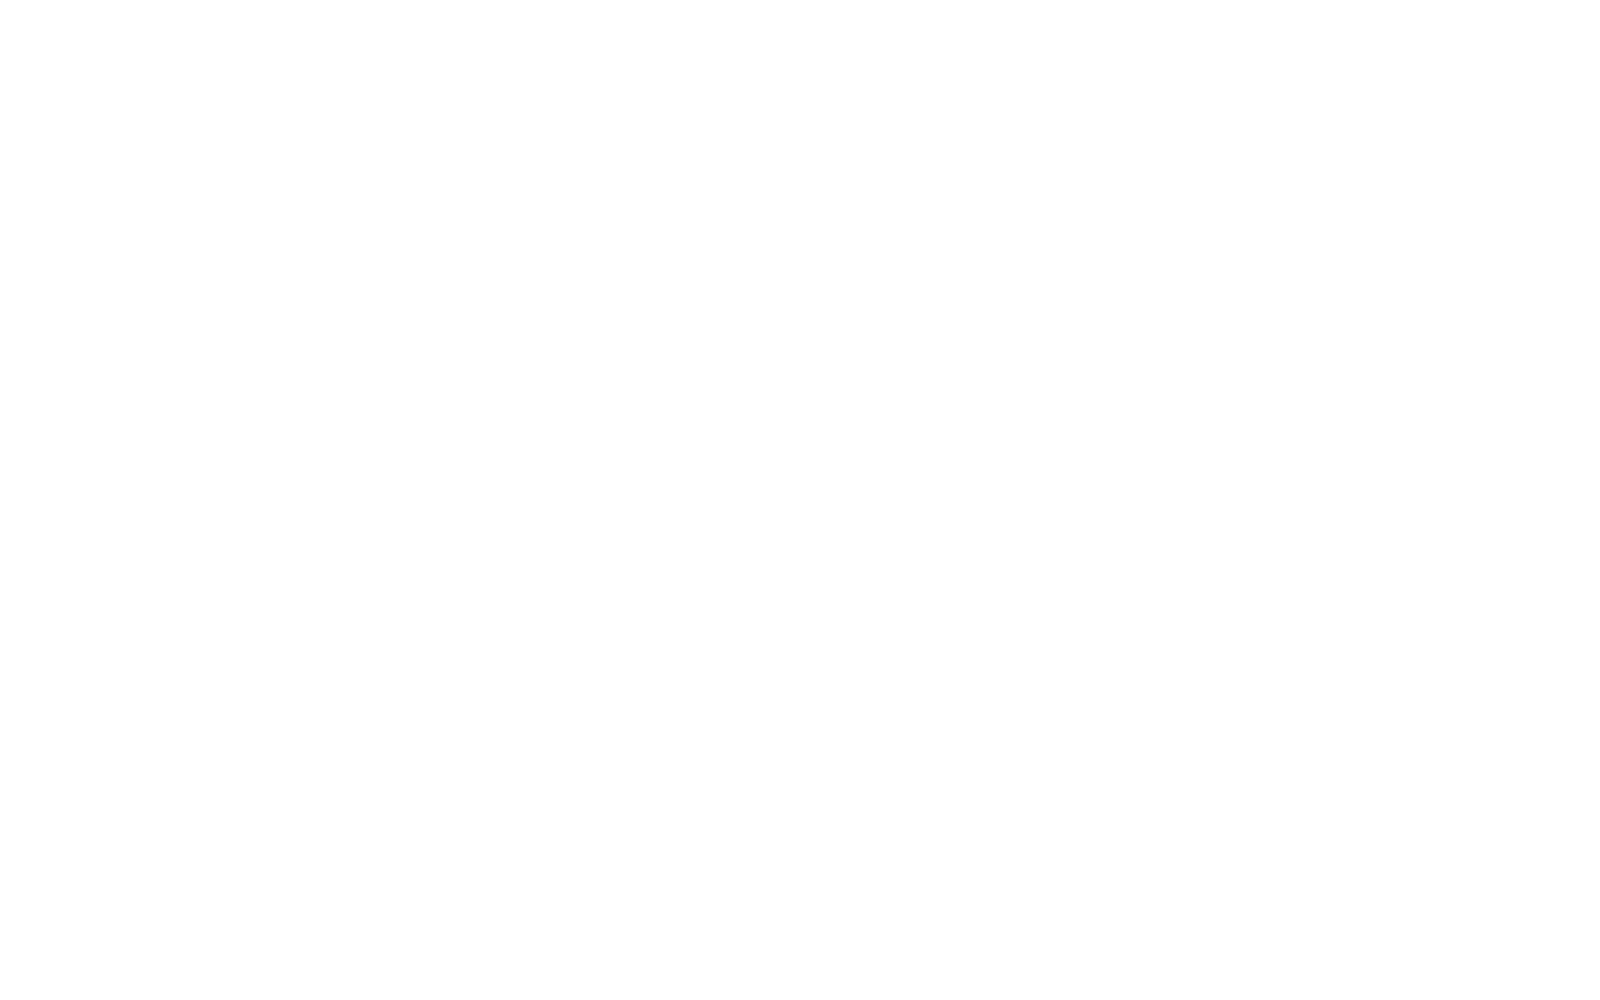 Vestwell-logo-white.png